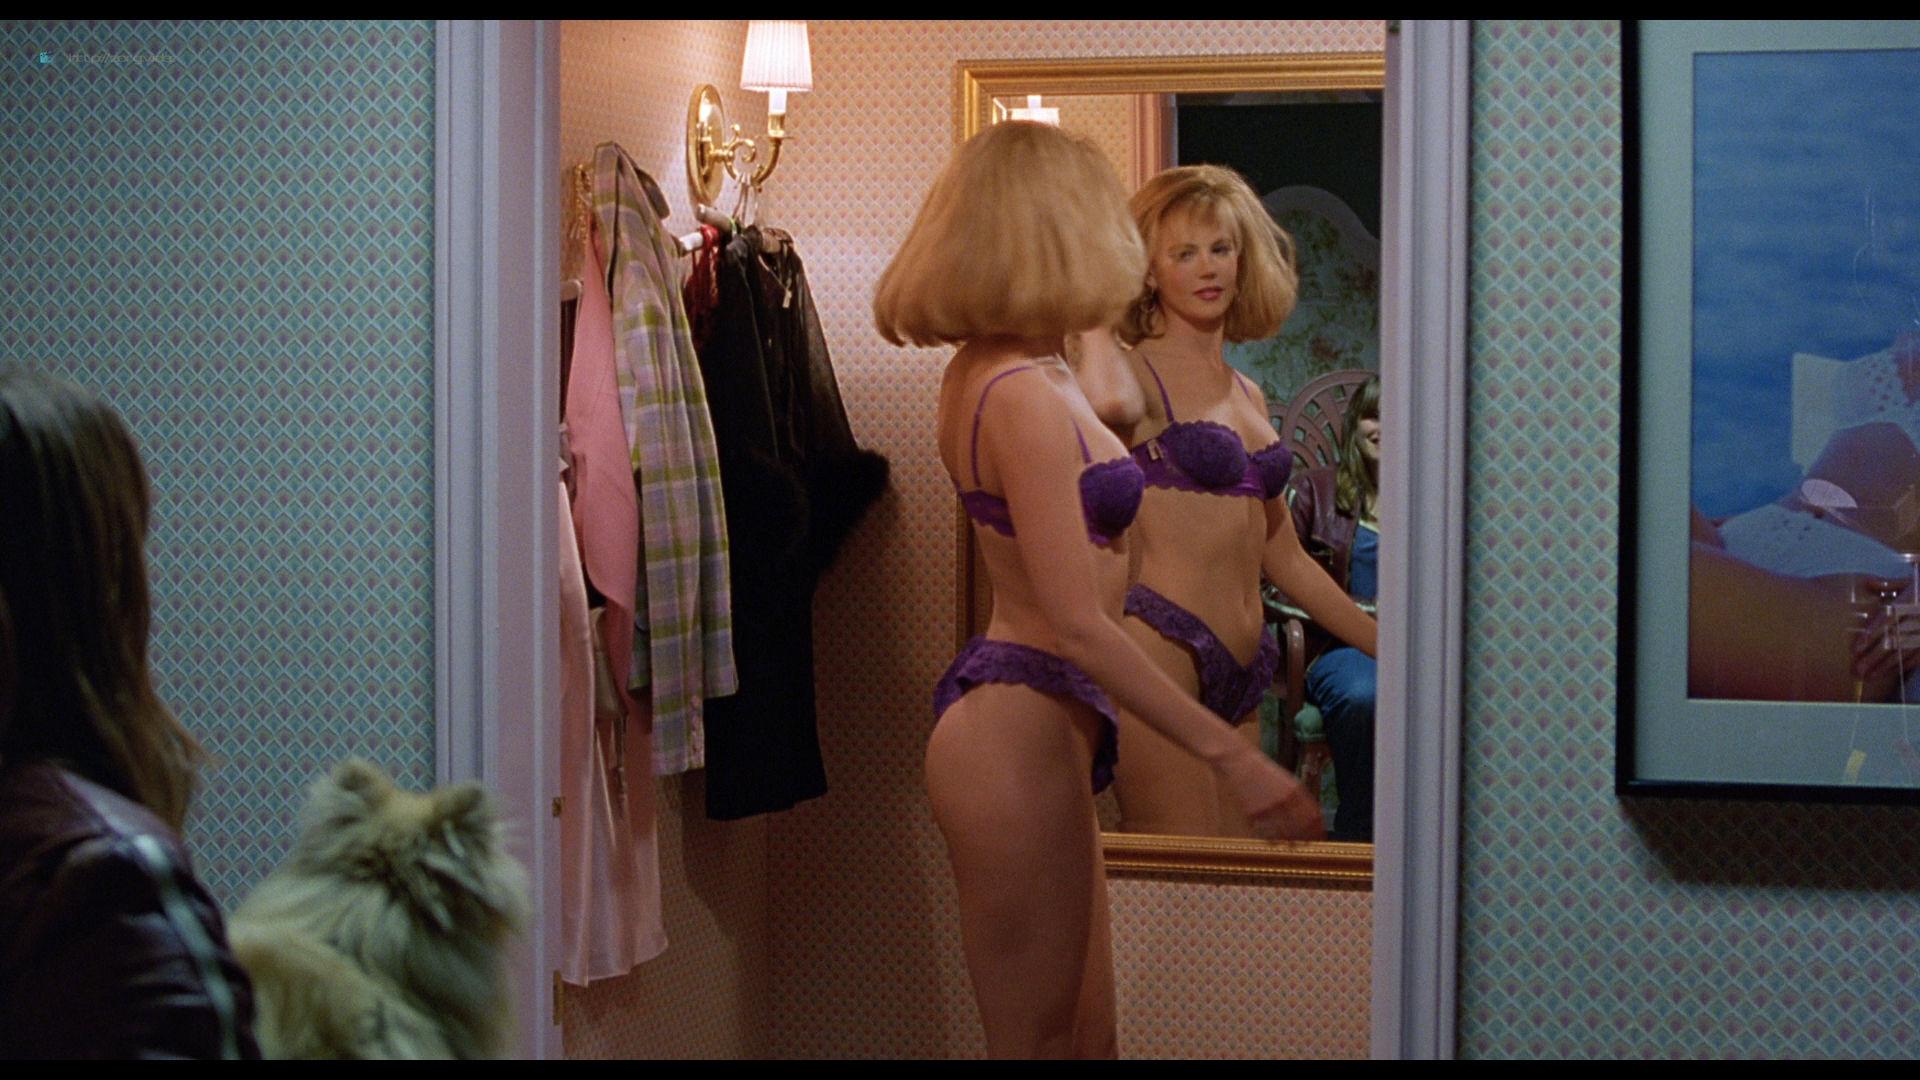 Nicole Kidman strips down to lace underwear in ultra-sexy